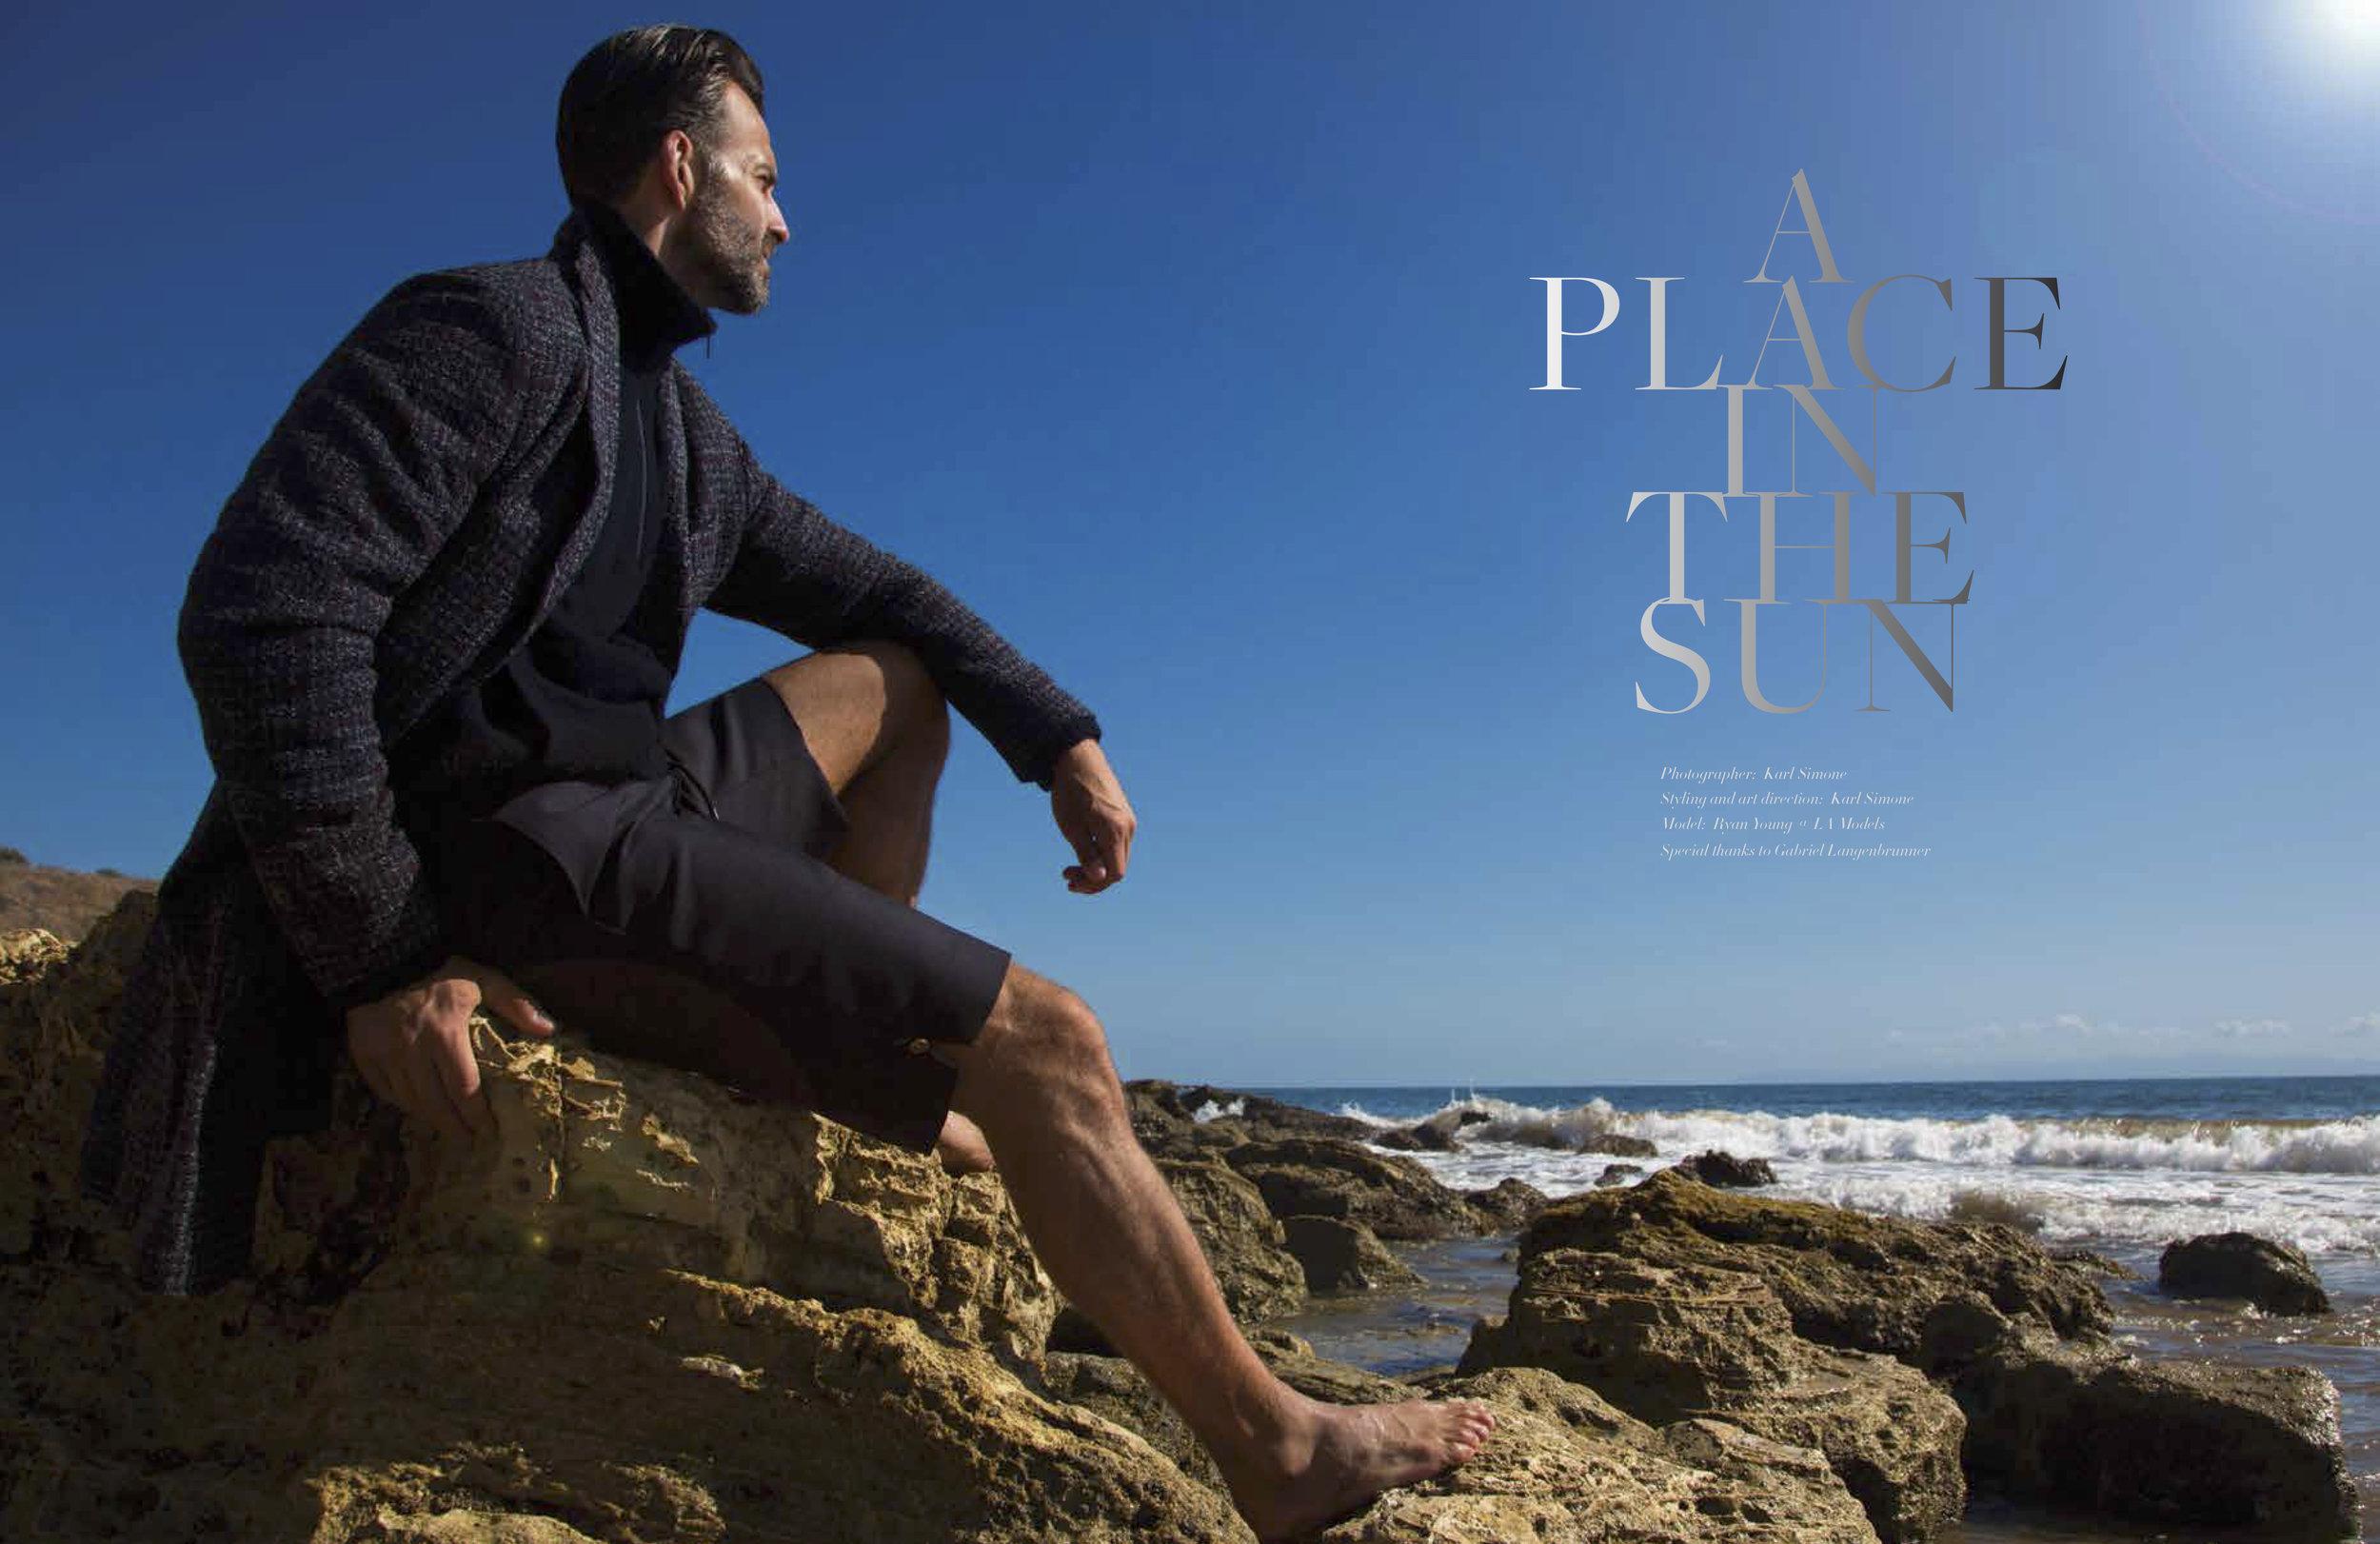 Coat: Neiman Marcus. Terry Half Zip: Vince Trouser Shorts: Thom Browne